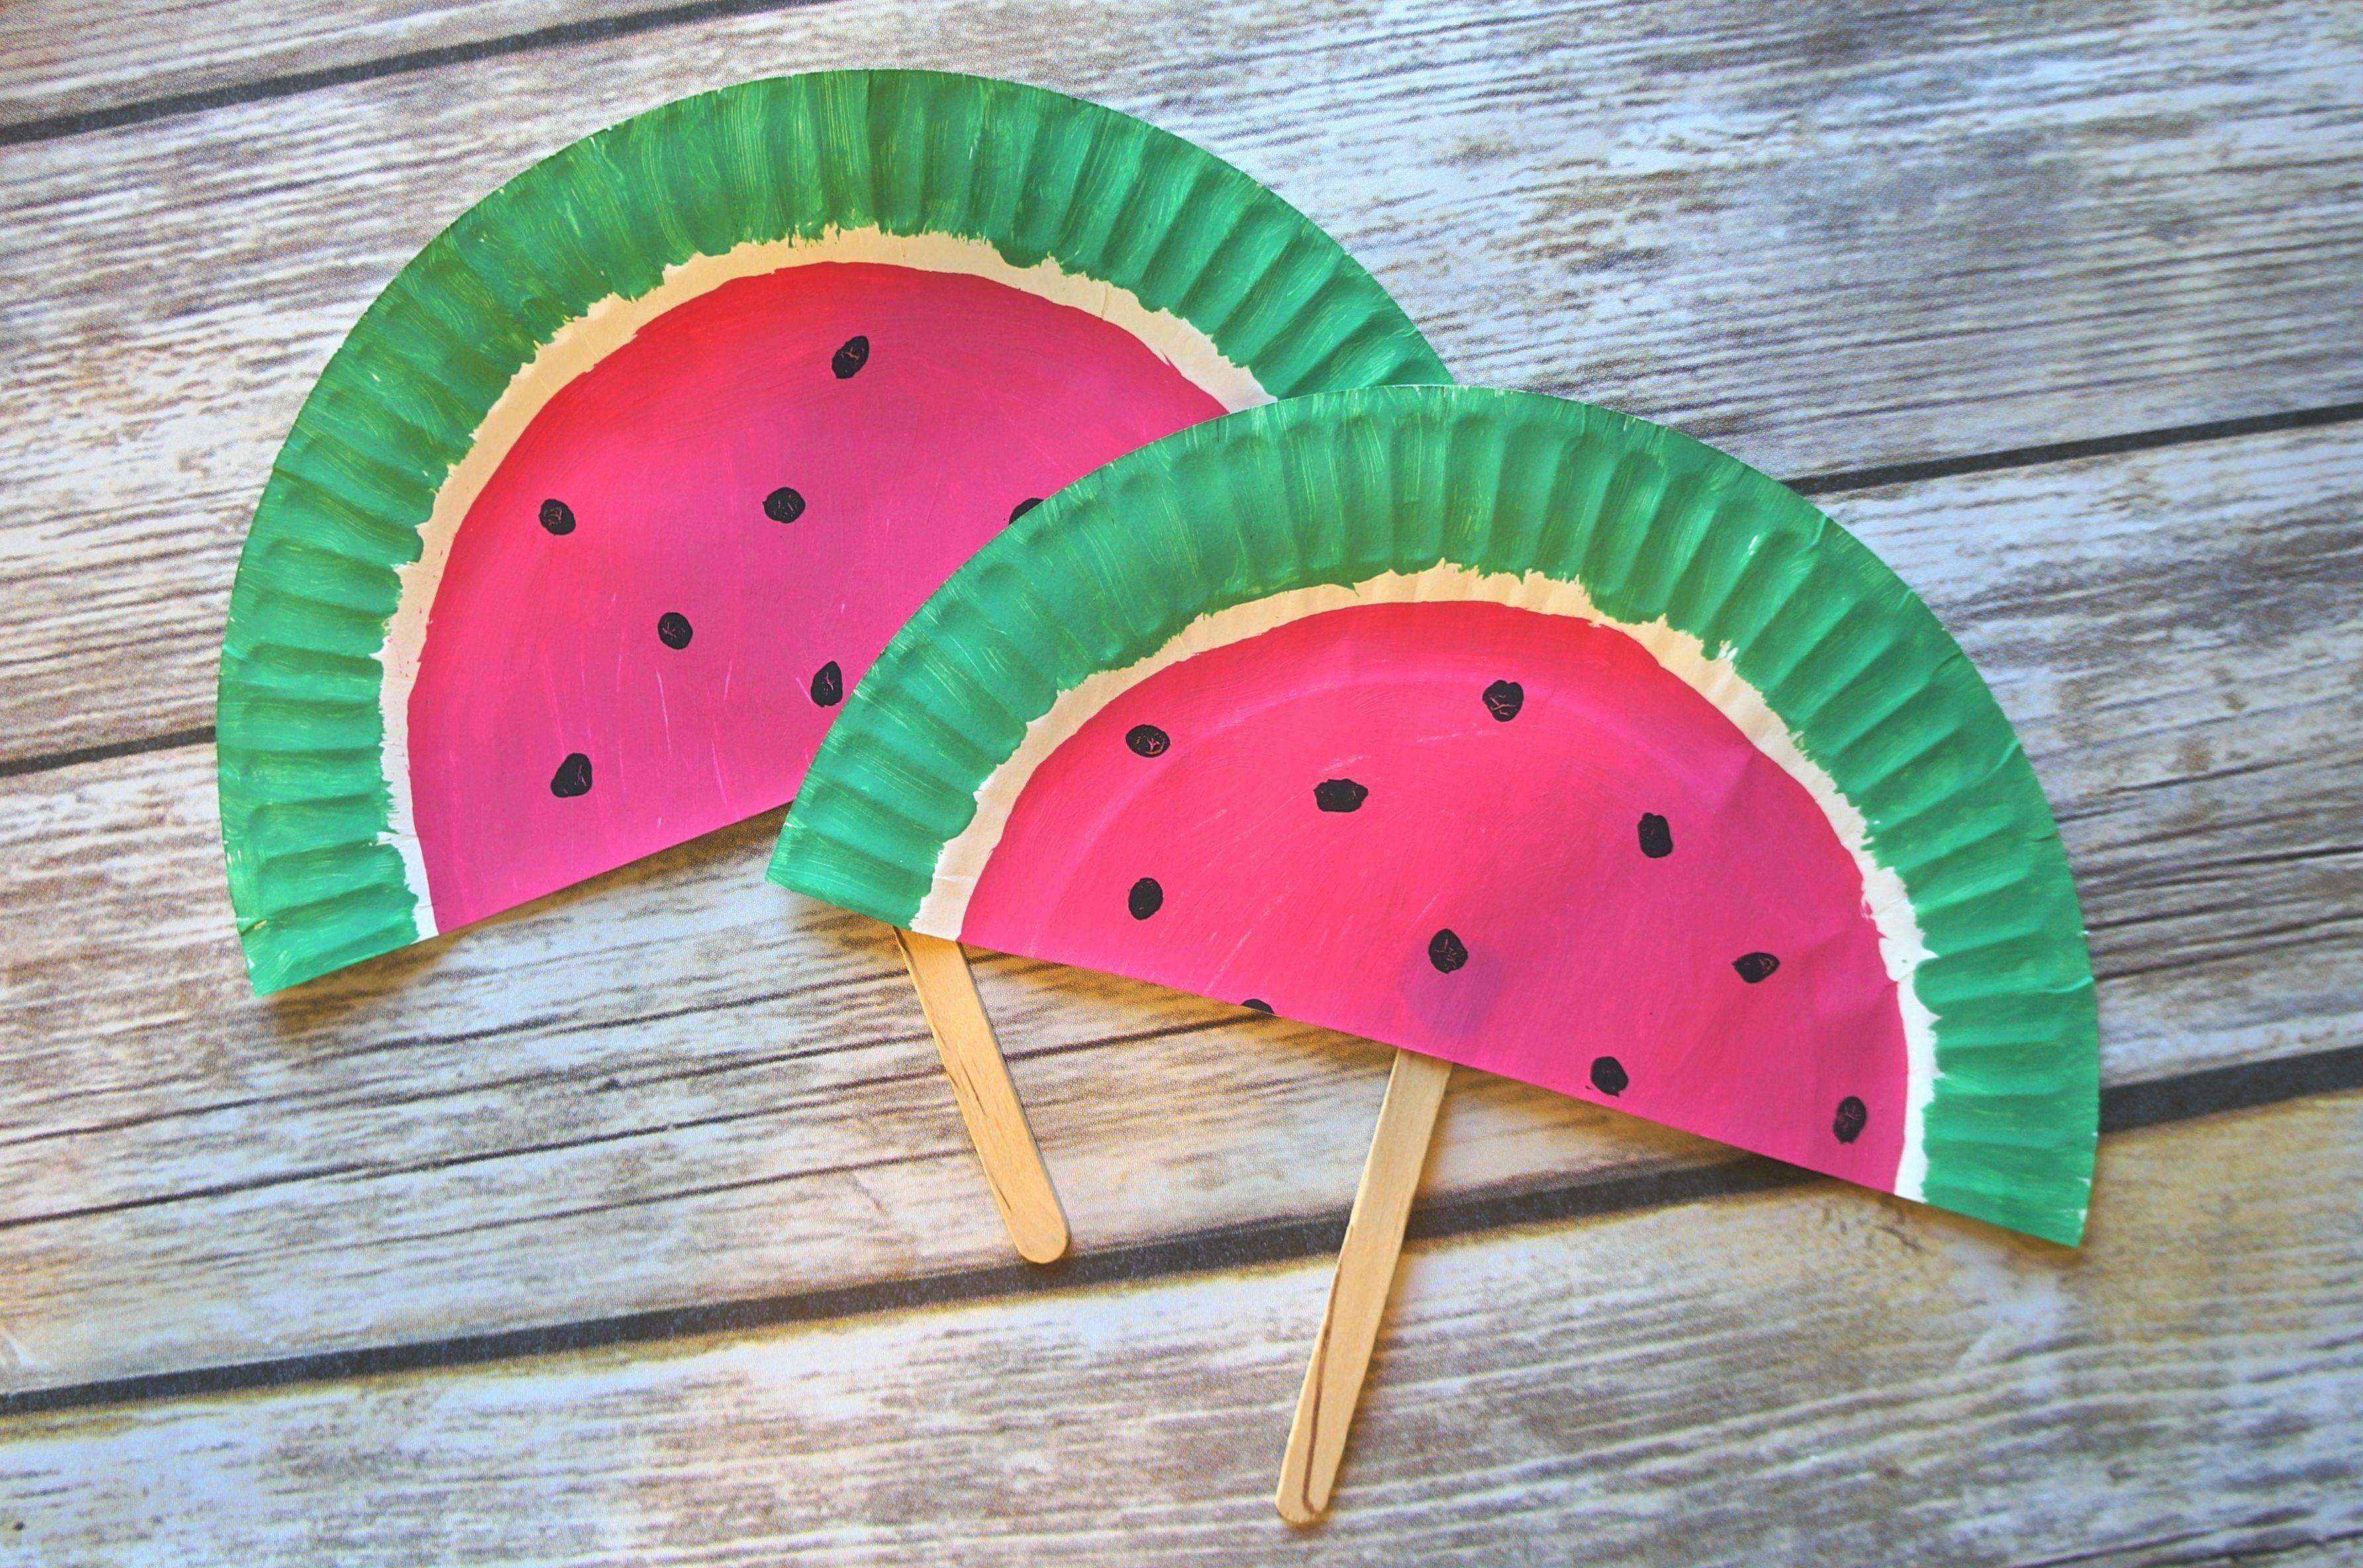 Diy Paper Plate Watermelon Fans Craft Such A Cute Summer Activity